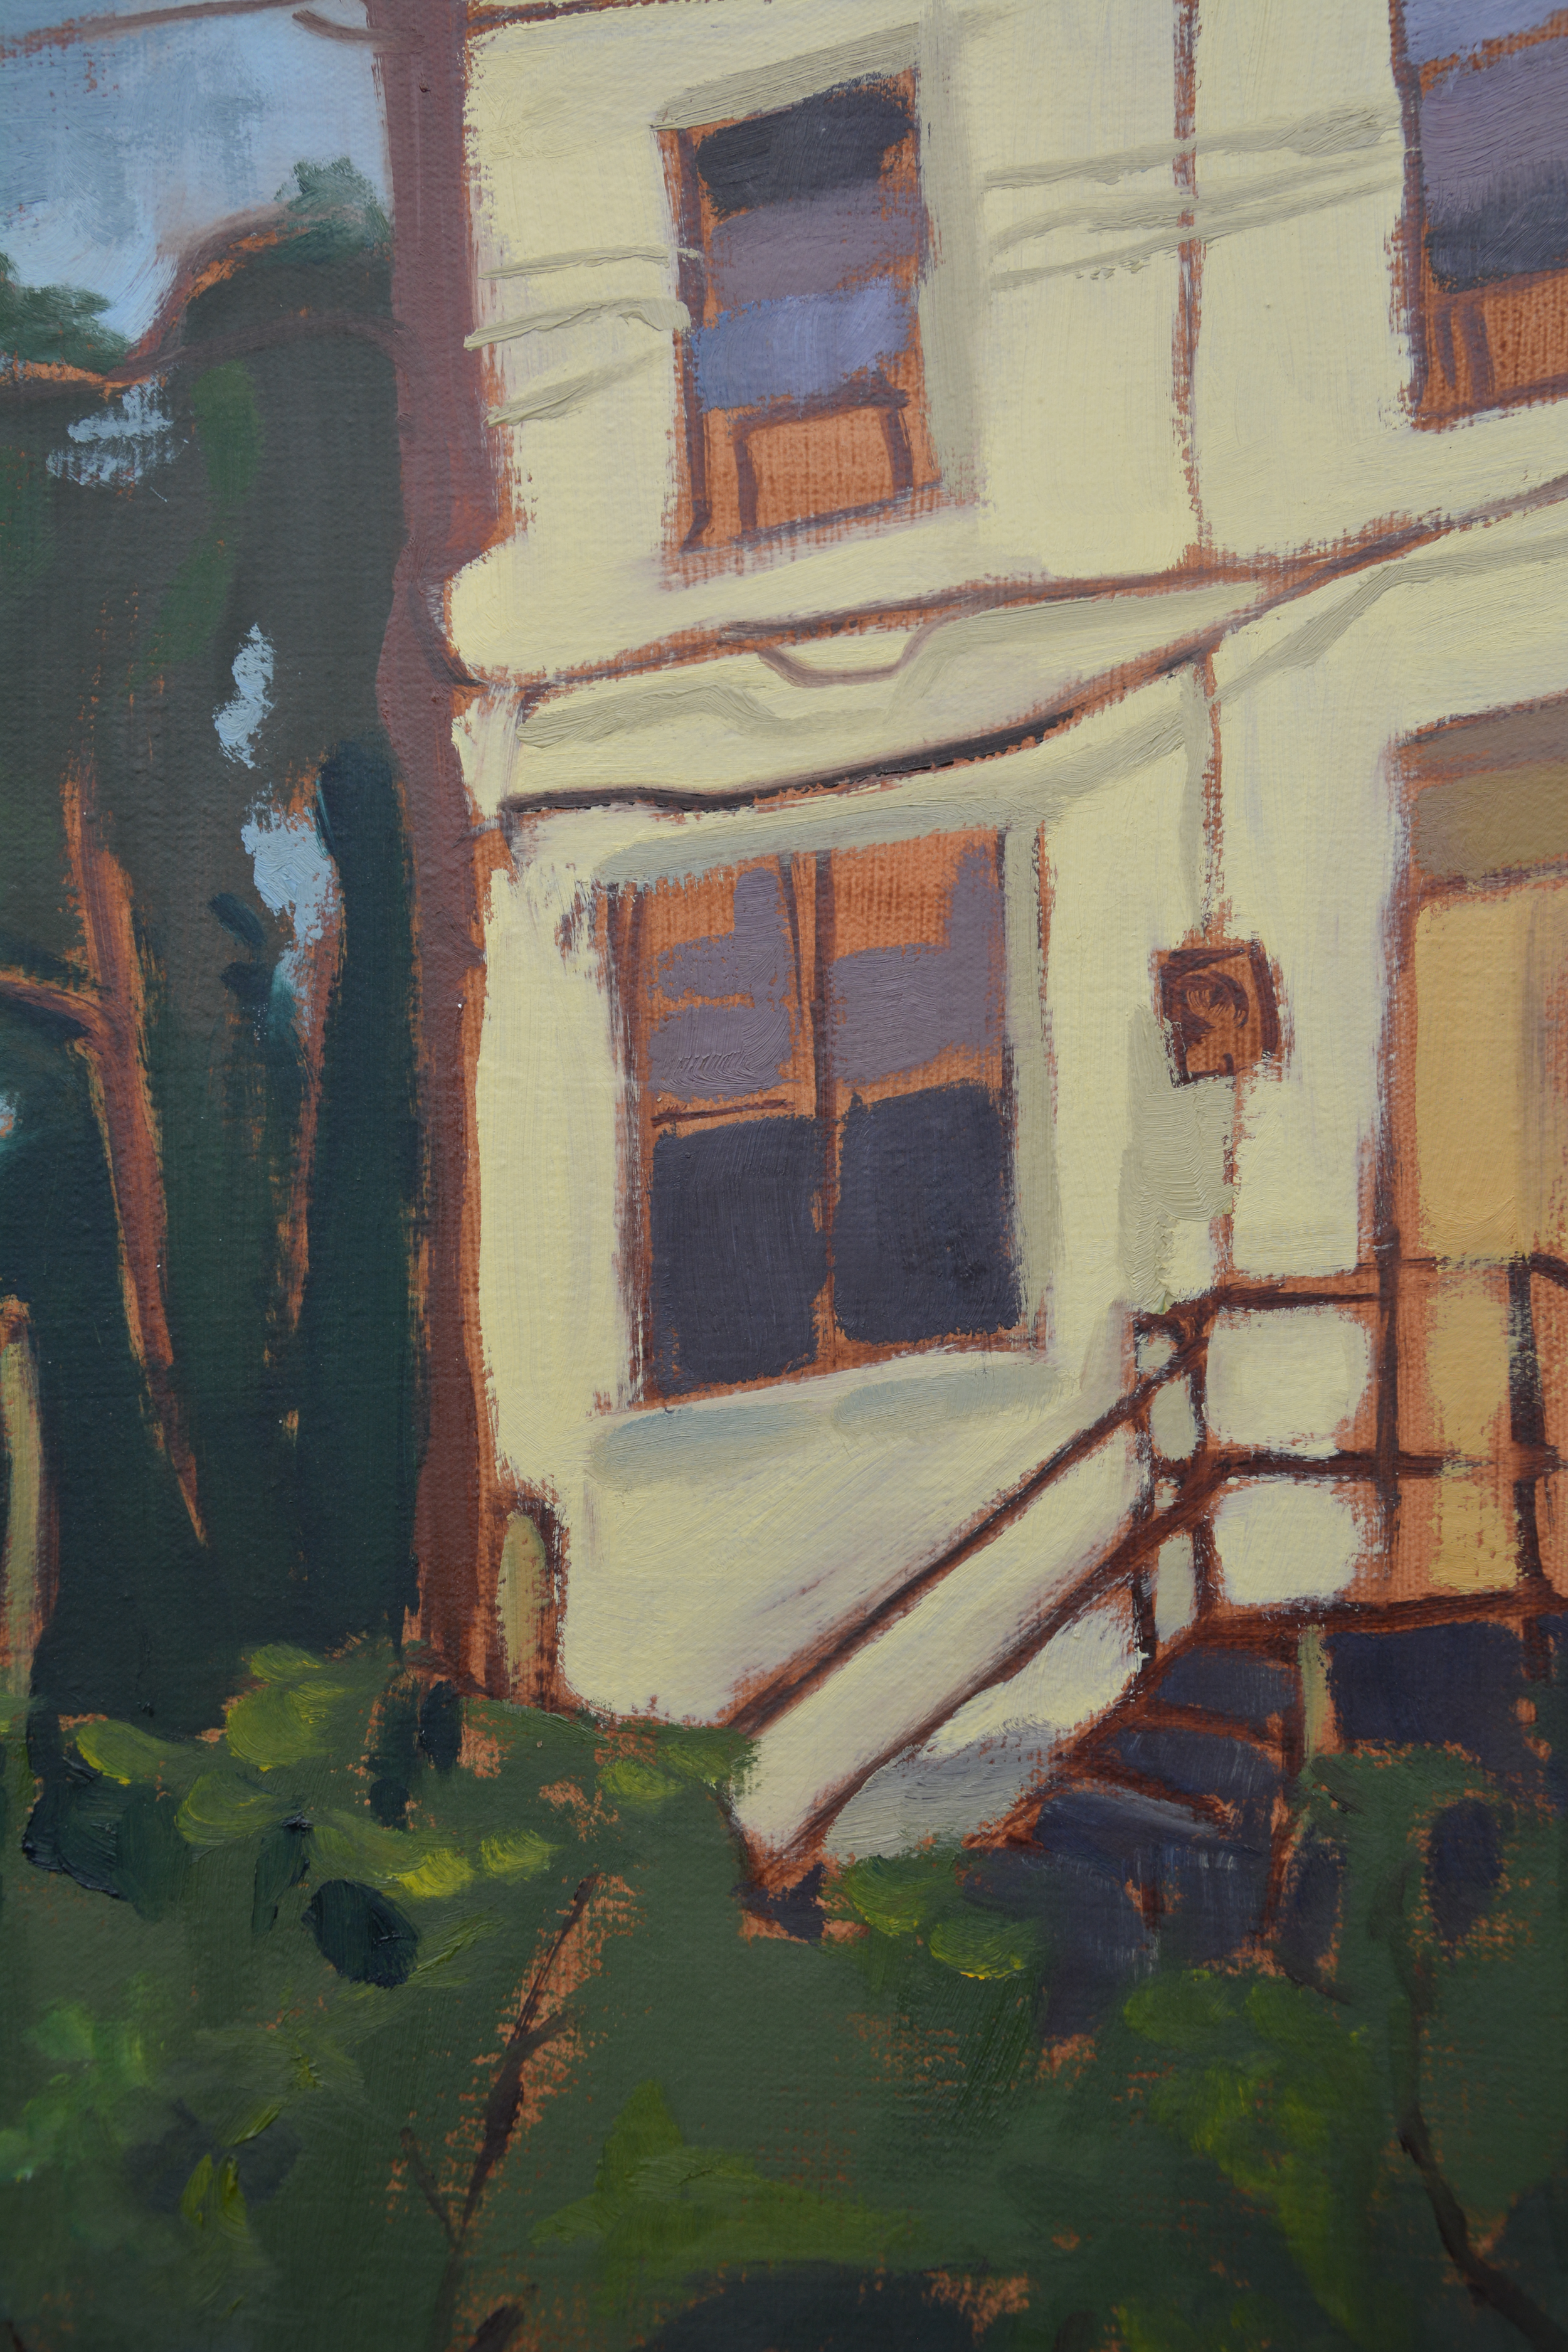 Hunting Park Community Garden, detail, oil on canvas, 2008